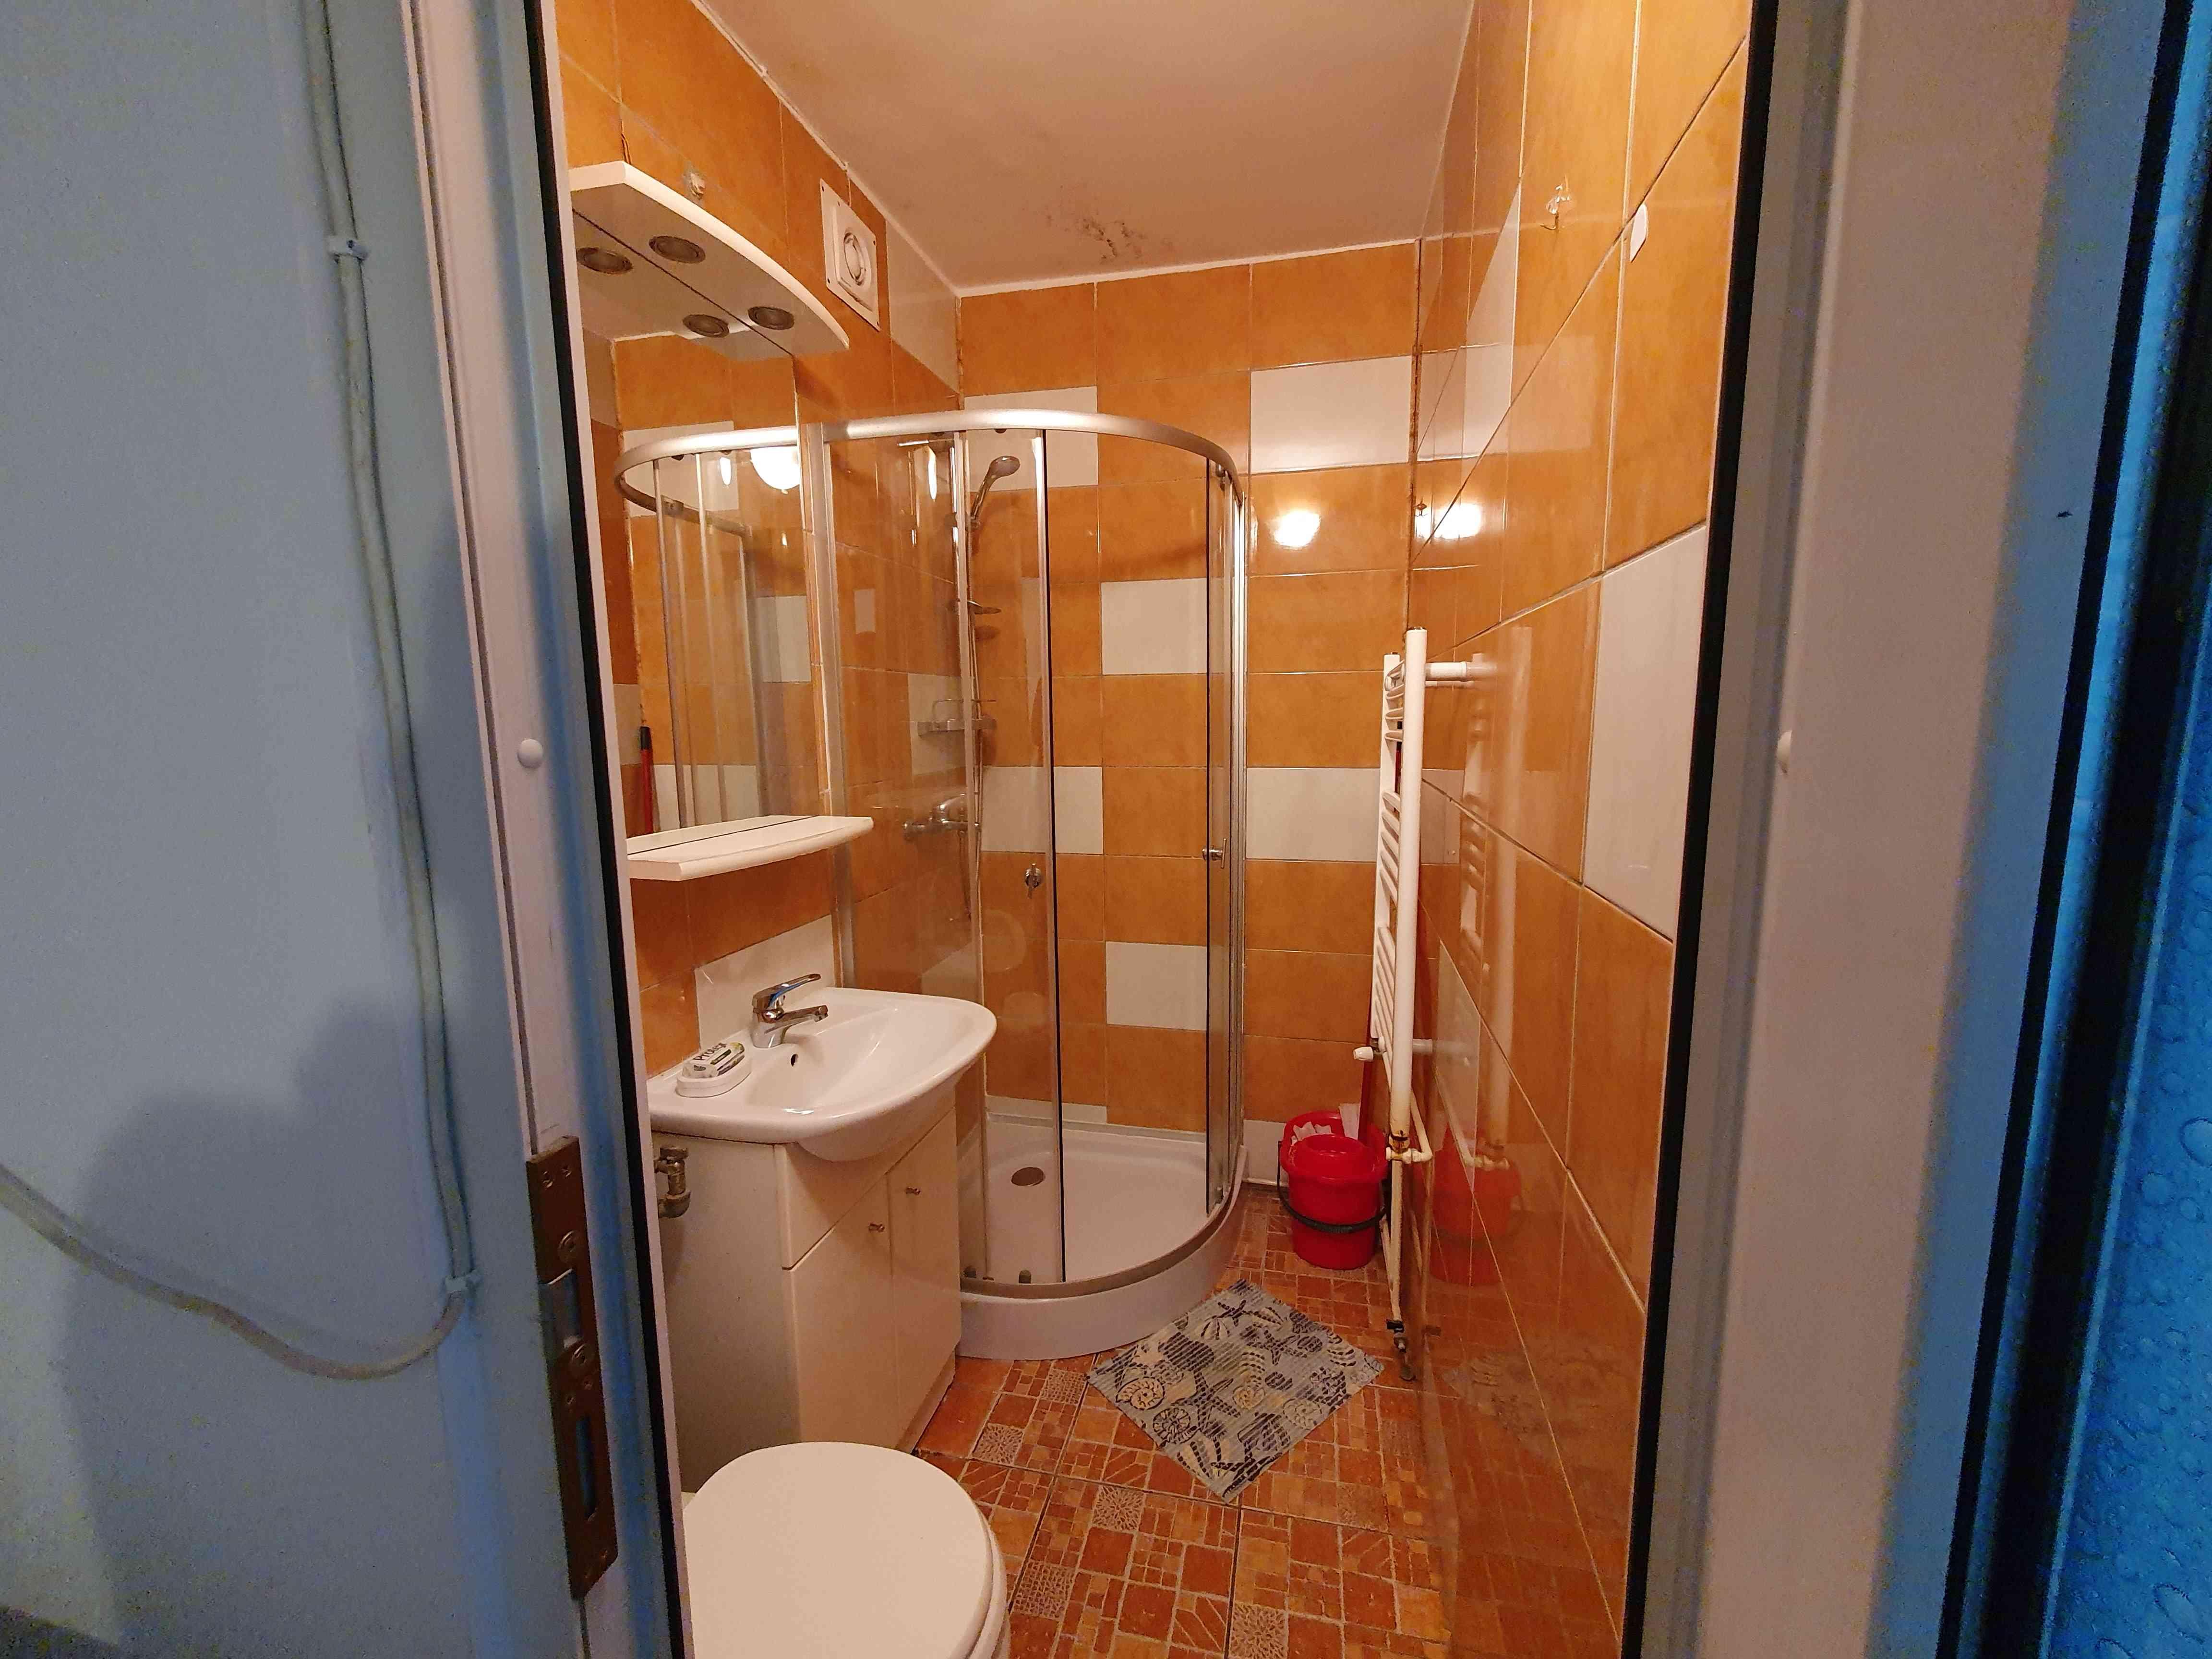 Inchiriere Apartament 2 Camere semidecomandat Centrul Civic